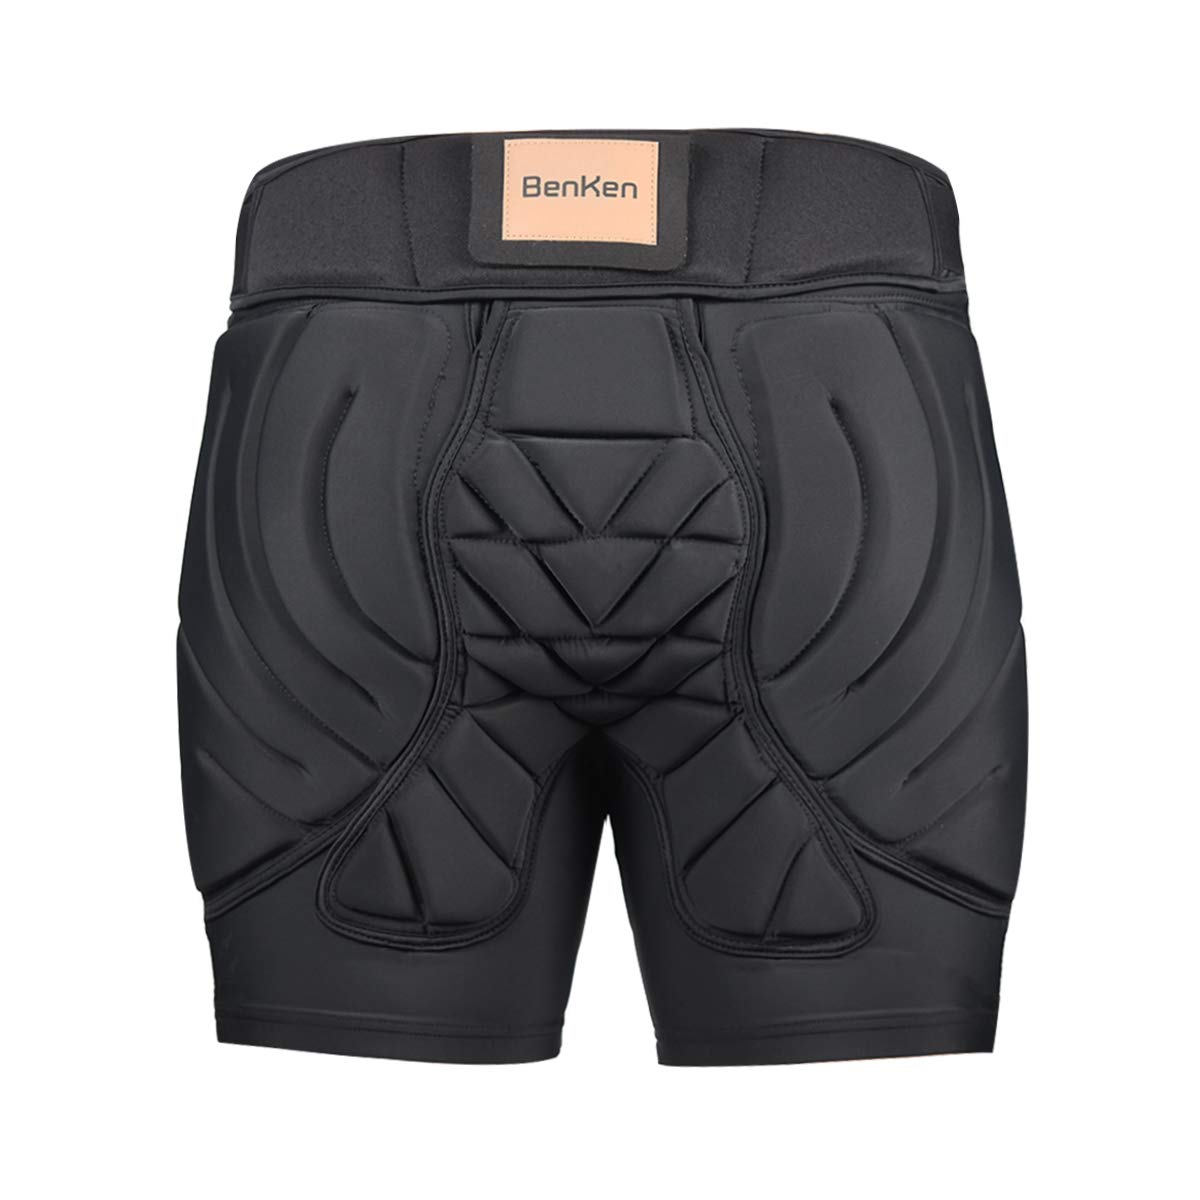 BenKen Hip Padded Pants,Women Men Anti-Fall Butt Protection Crash Pants for Mountain Bike Skateboarding Cycling Street Motocross Climbing (26''-43'' Waist)(Black L)